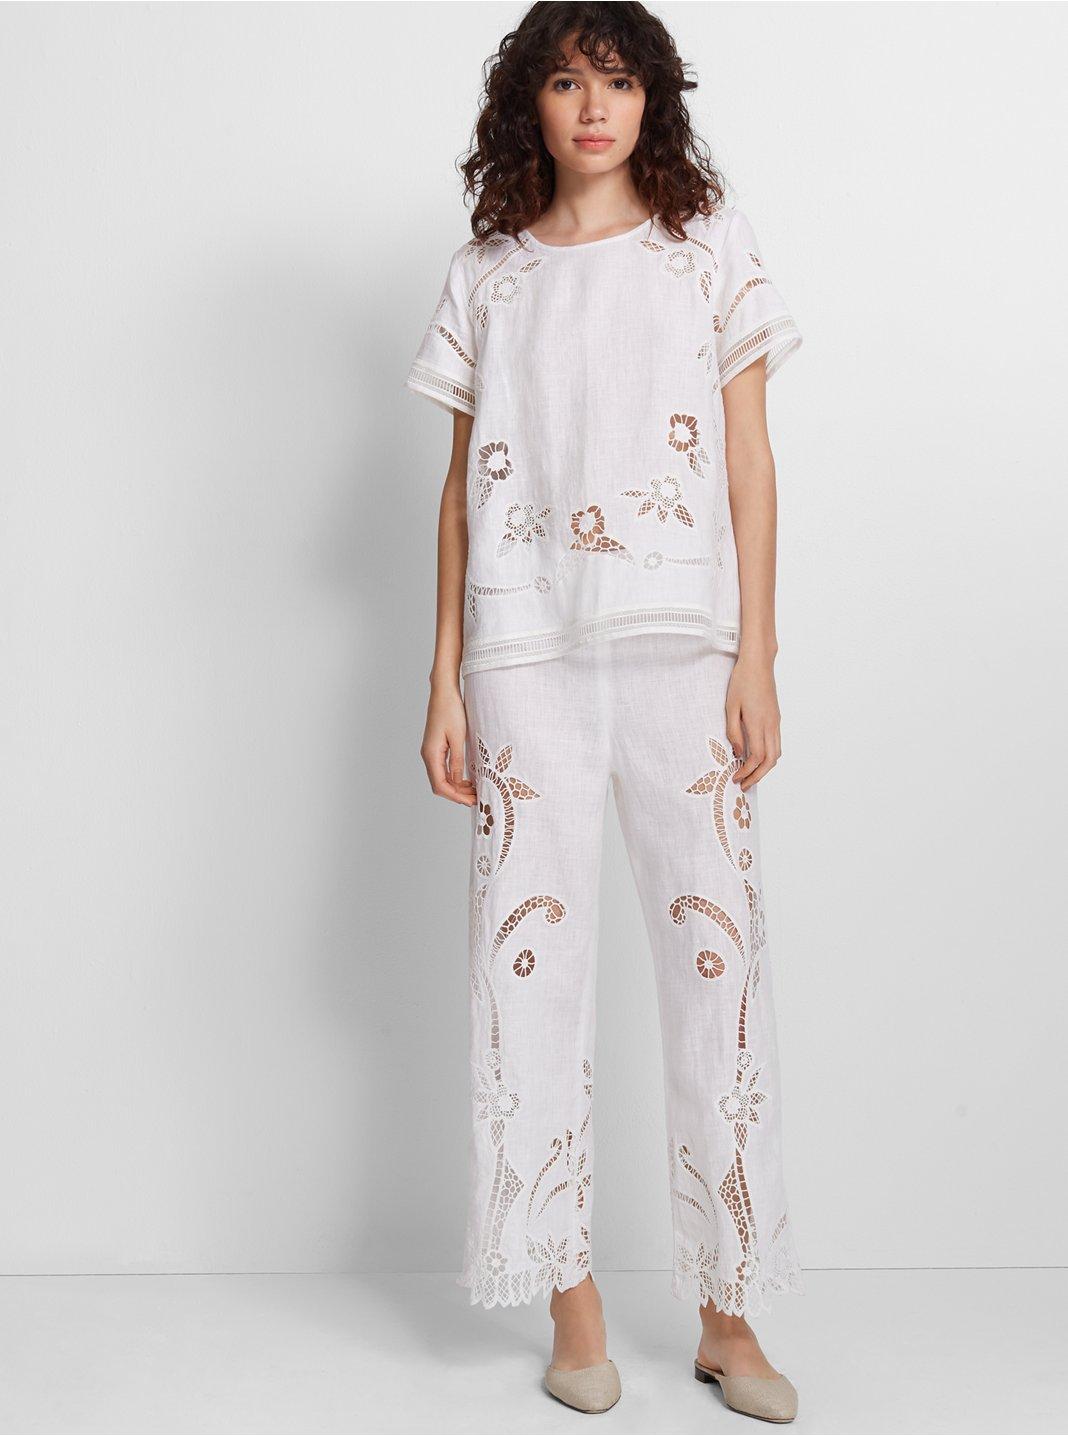 Lorrenah Linen Pant